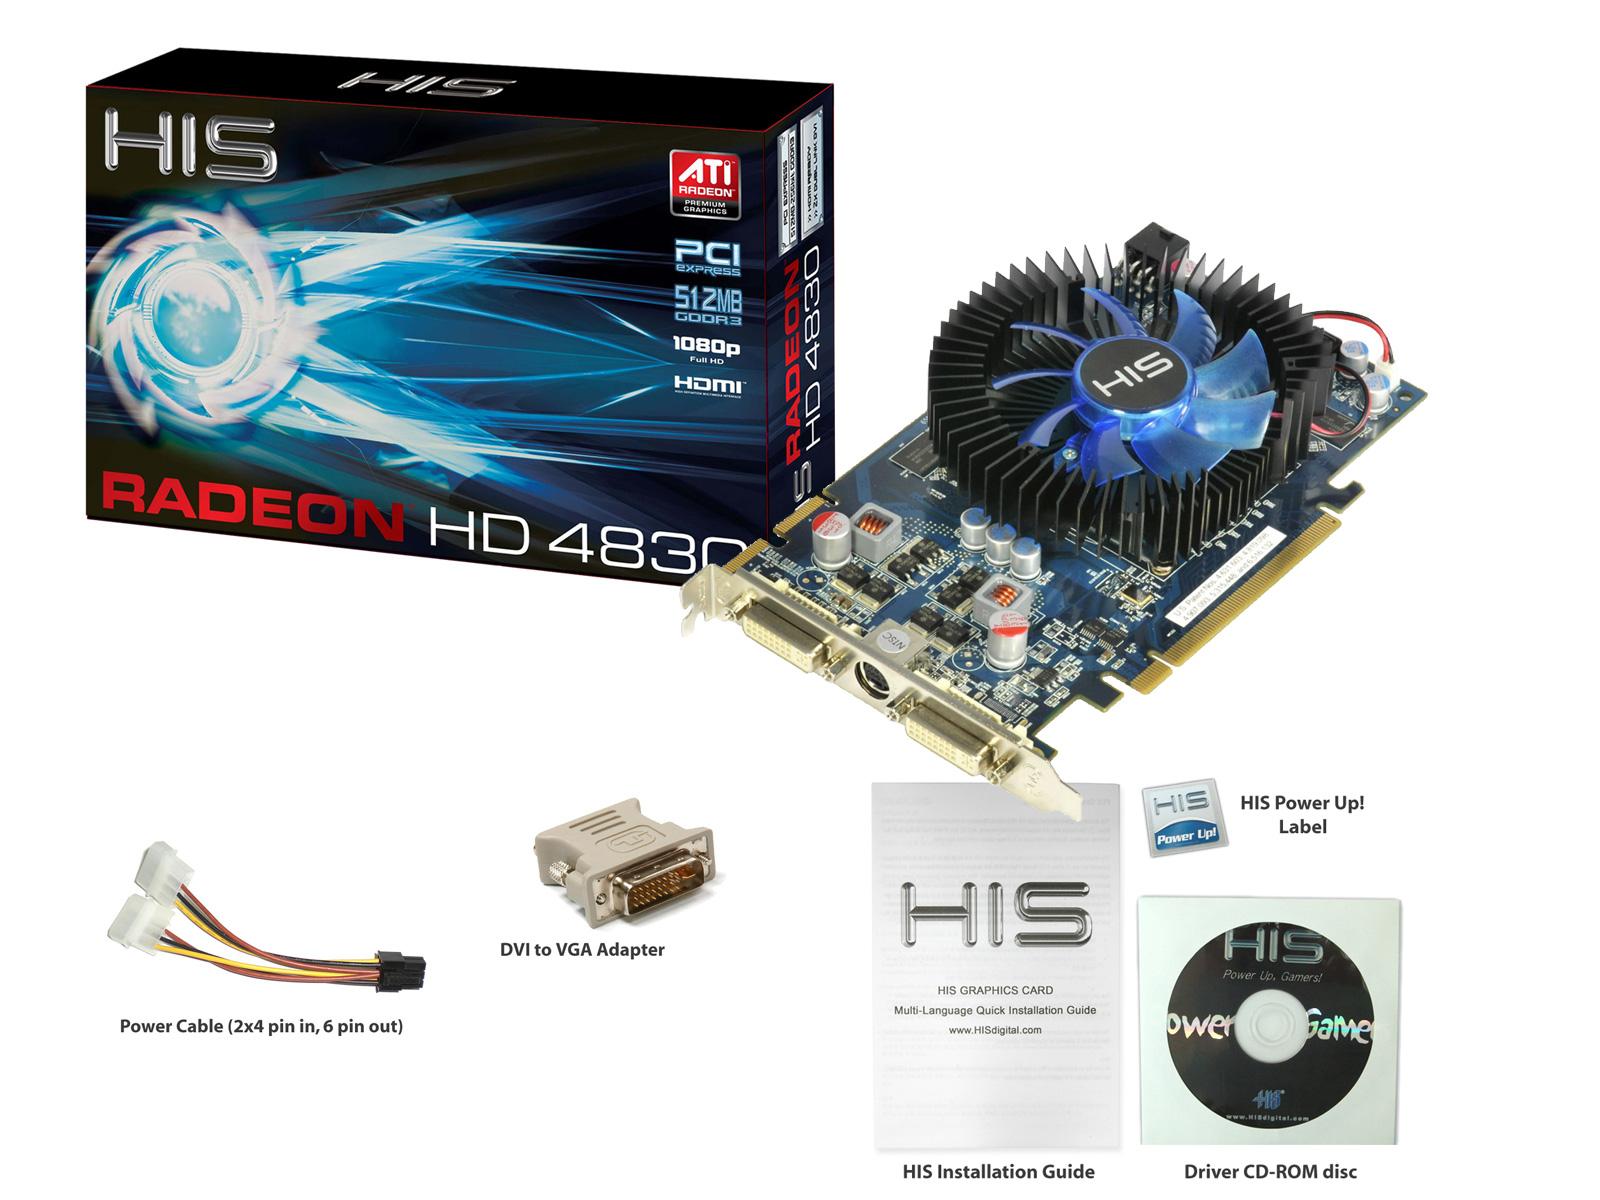 Sapphire Radeon HD4830 512MB DDR3 Dual DVI TVO PCI-Express Graphics Card